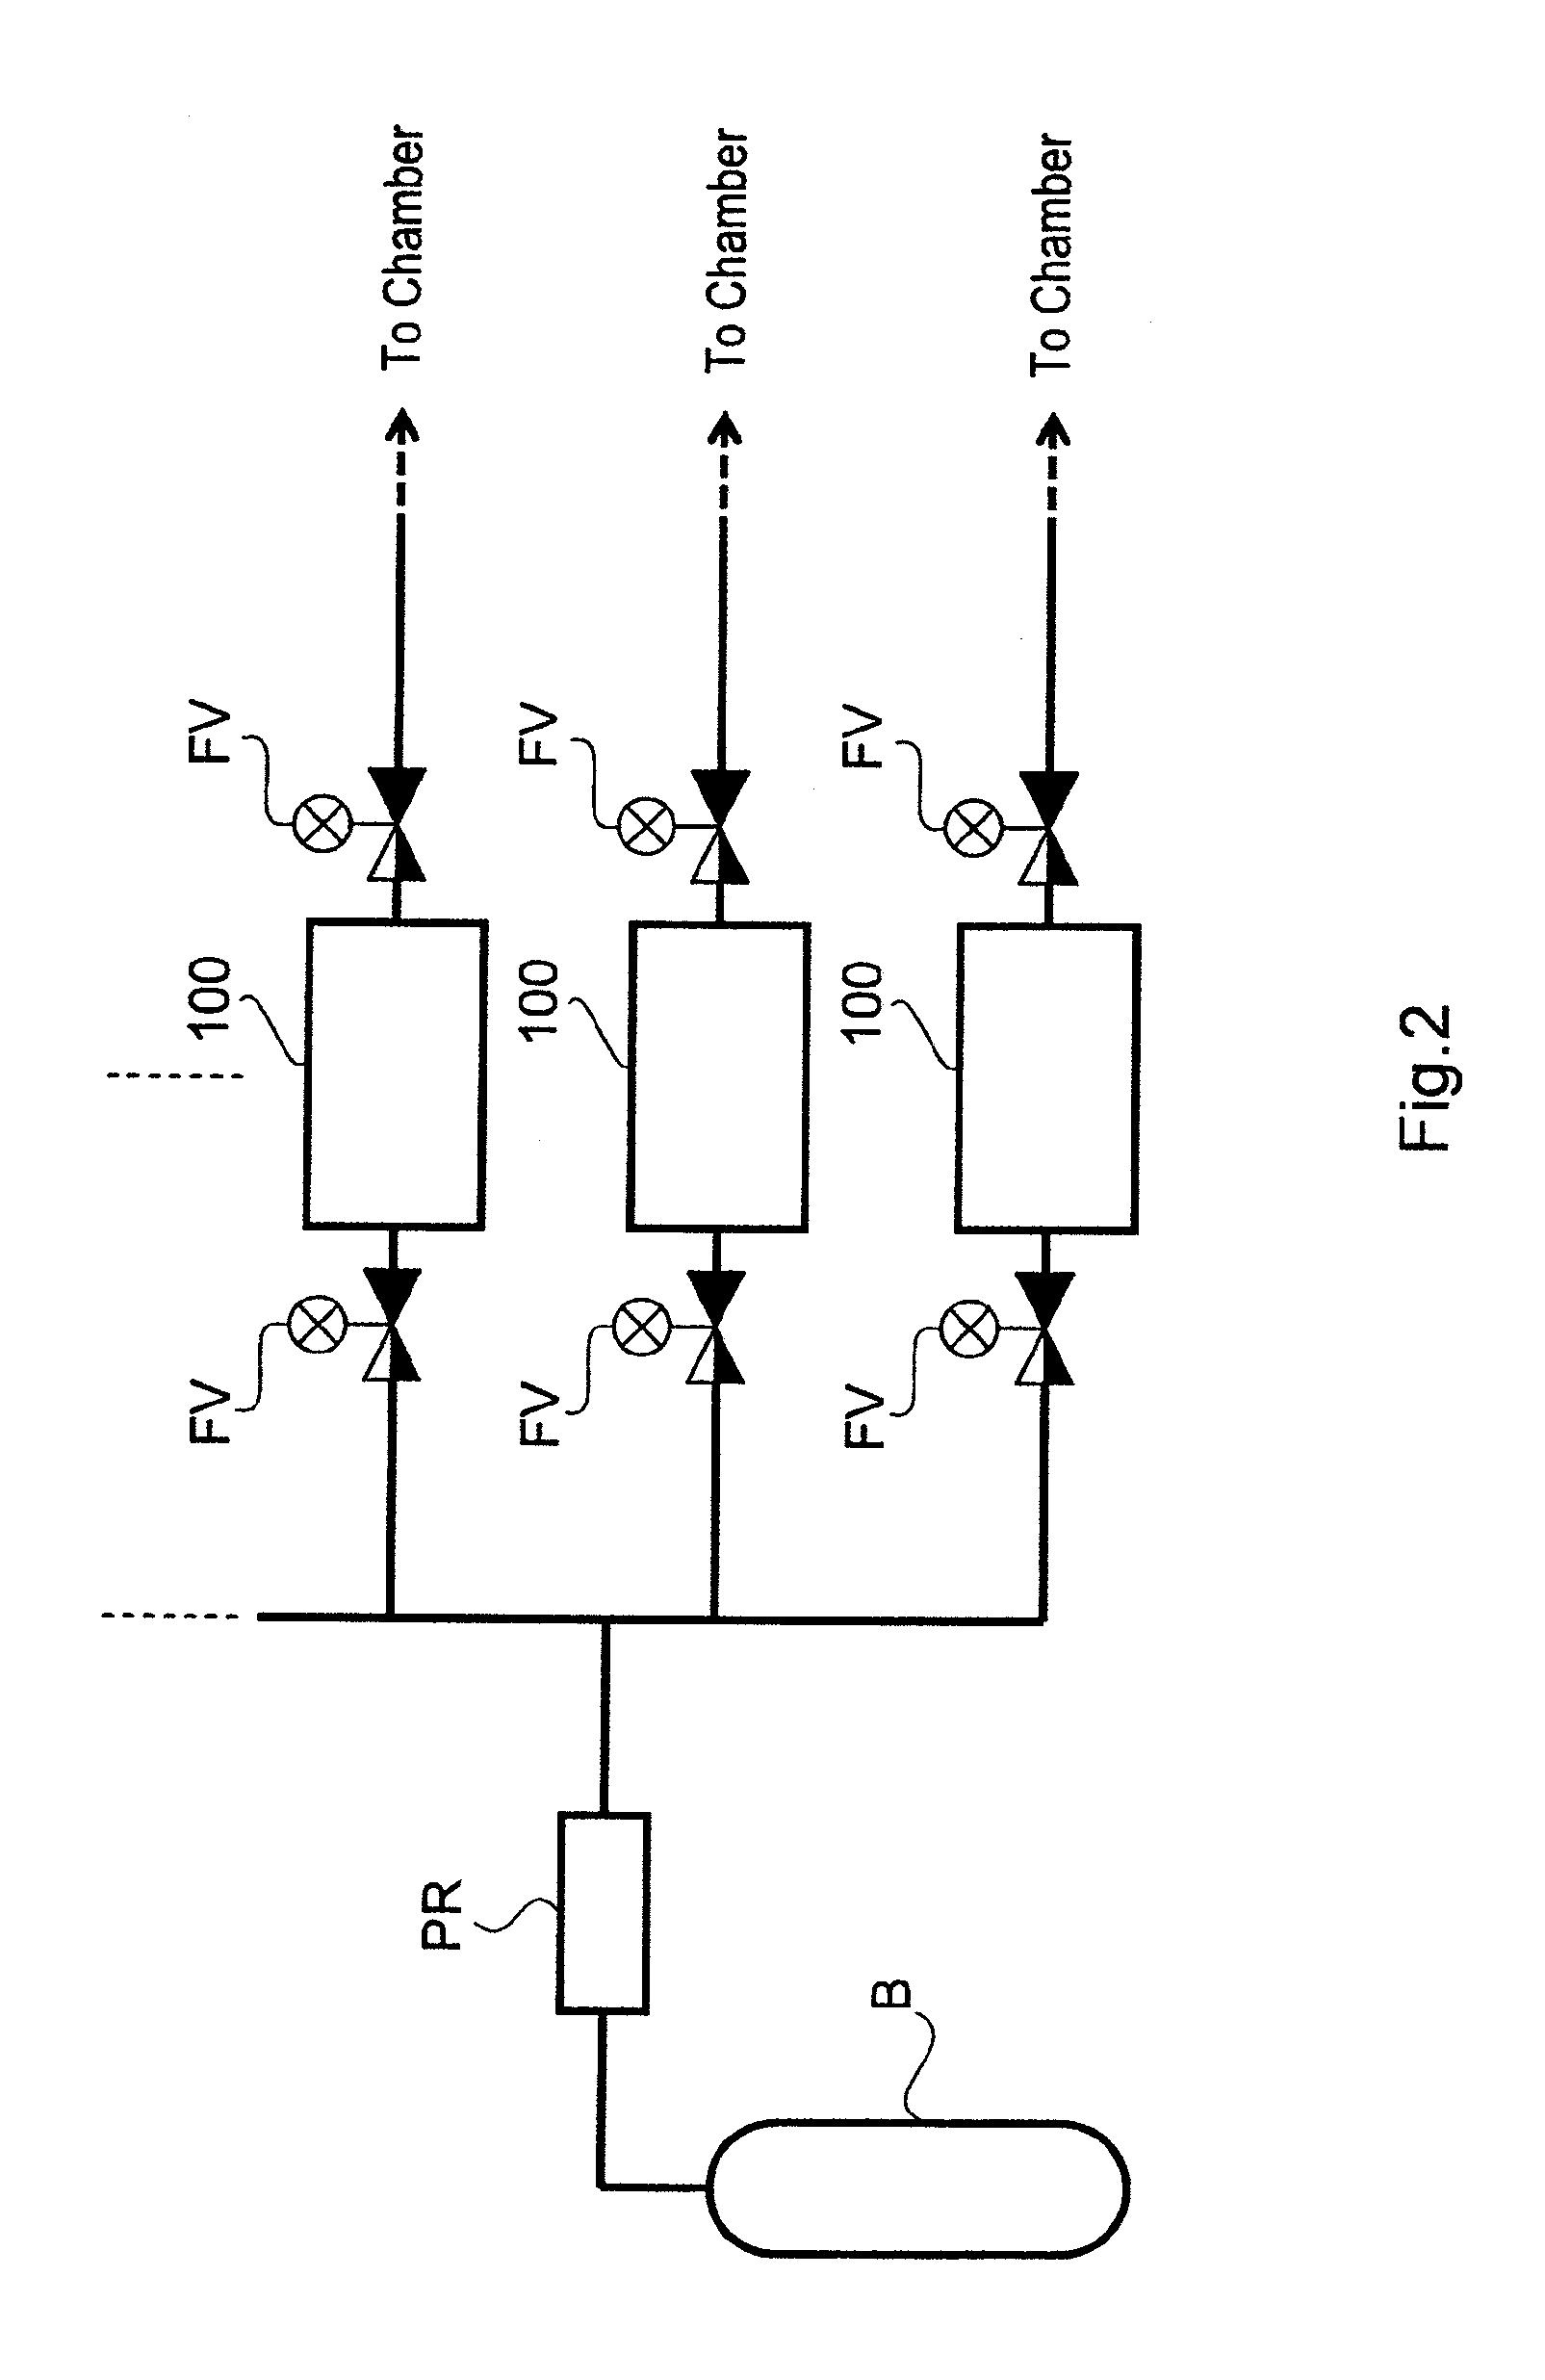 mass flow controller symbol darkpestpesaltgq